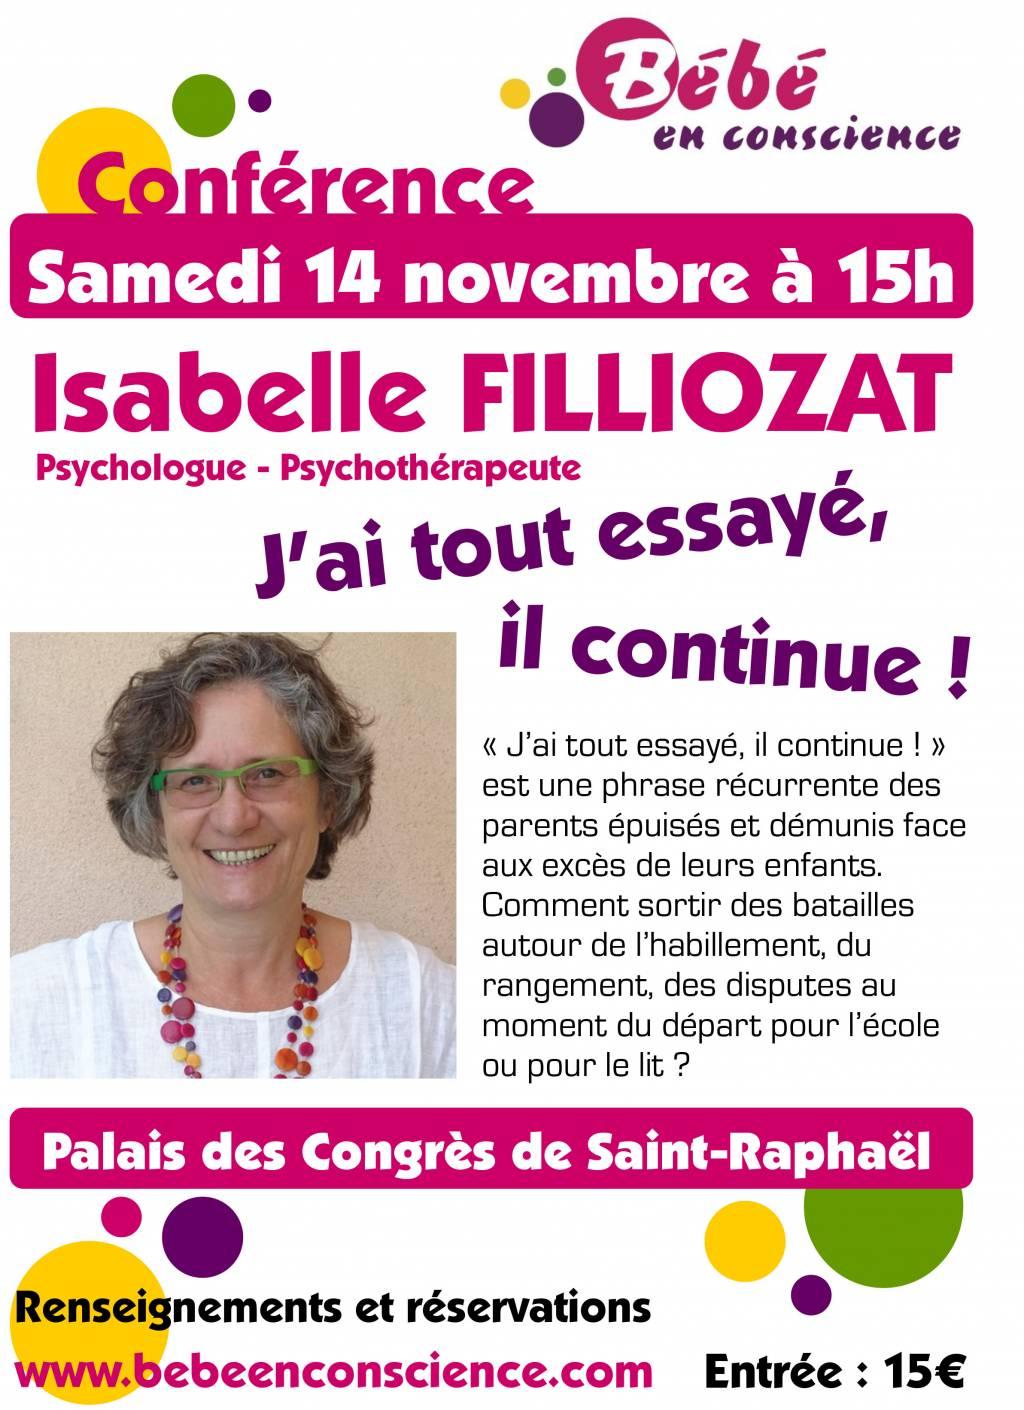 Affiche Conférence Isabelle Filliozat 2015